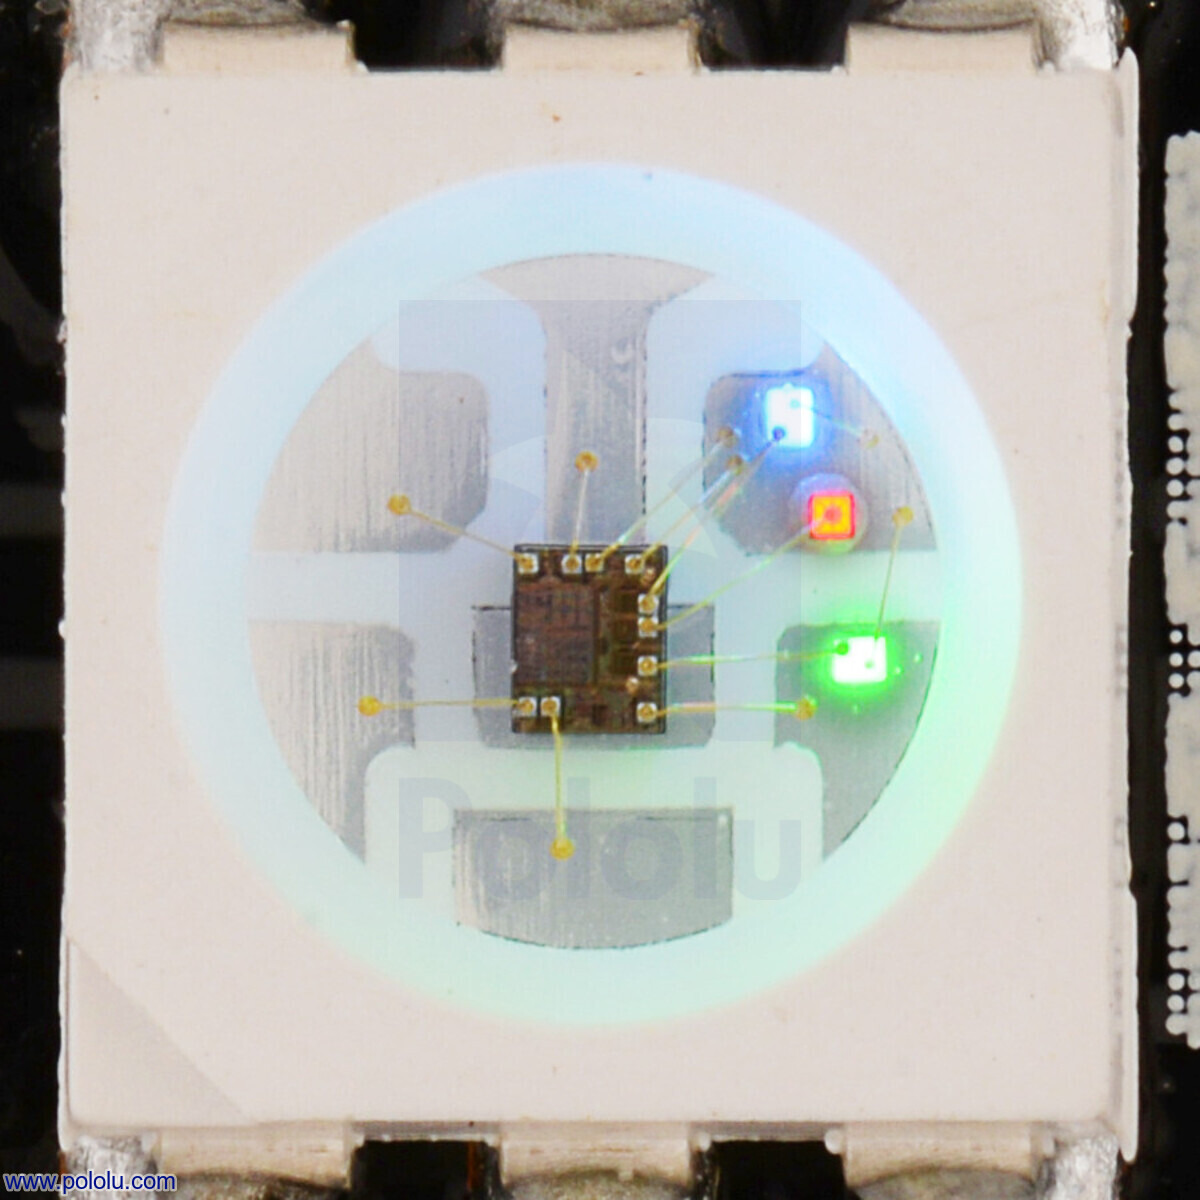 Pololu - Addressable RGB 8x8-LED Flexible Panel, 5V, 10mm Grid (SK9822)